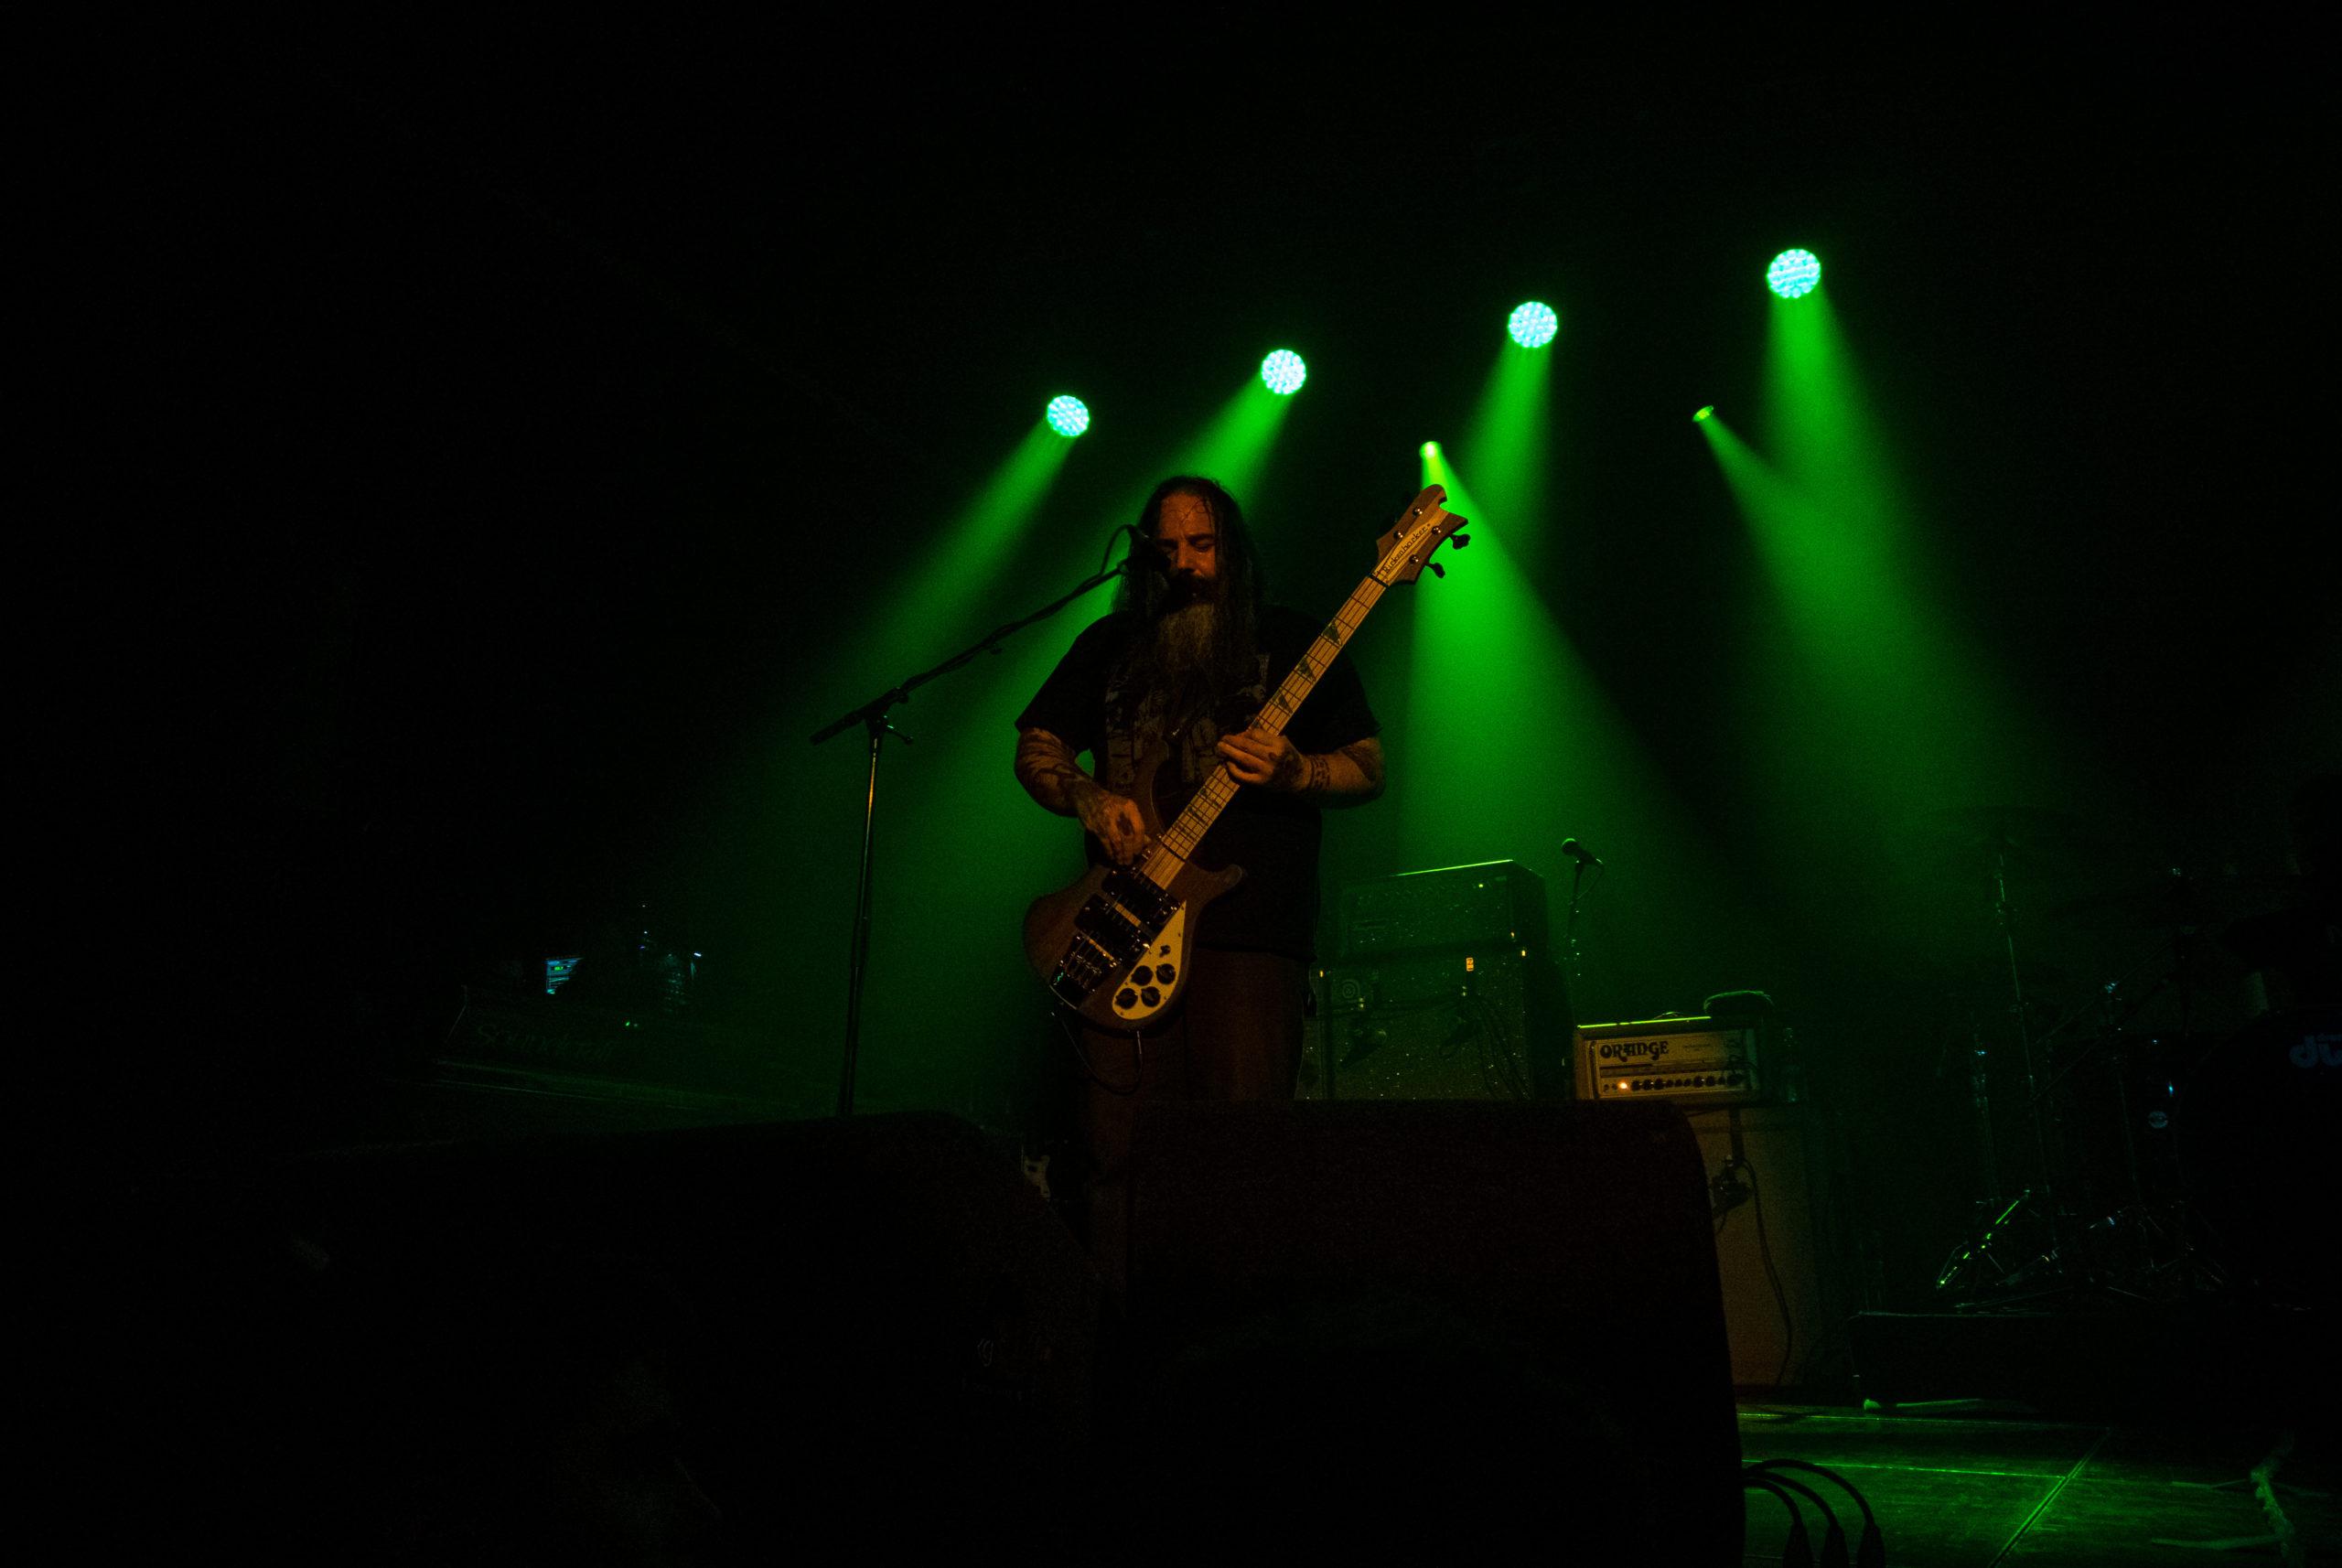 Al Cisnero au concert de Sleep au Melkweg d'Amsterdam